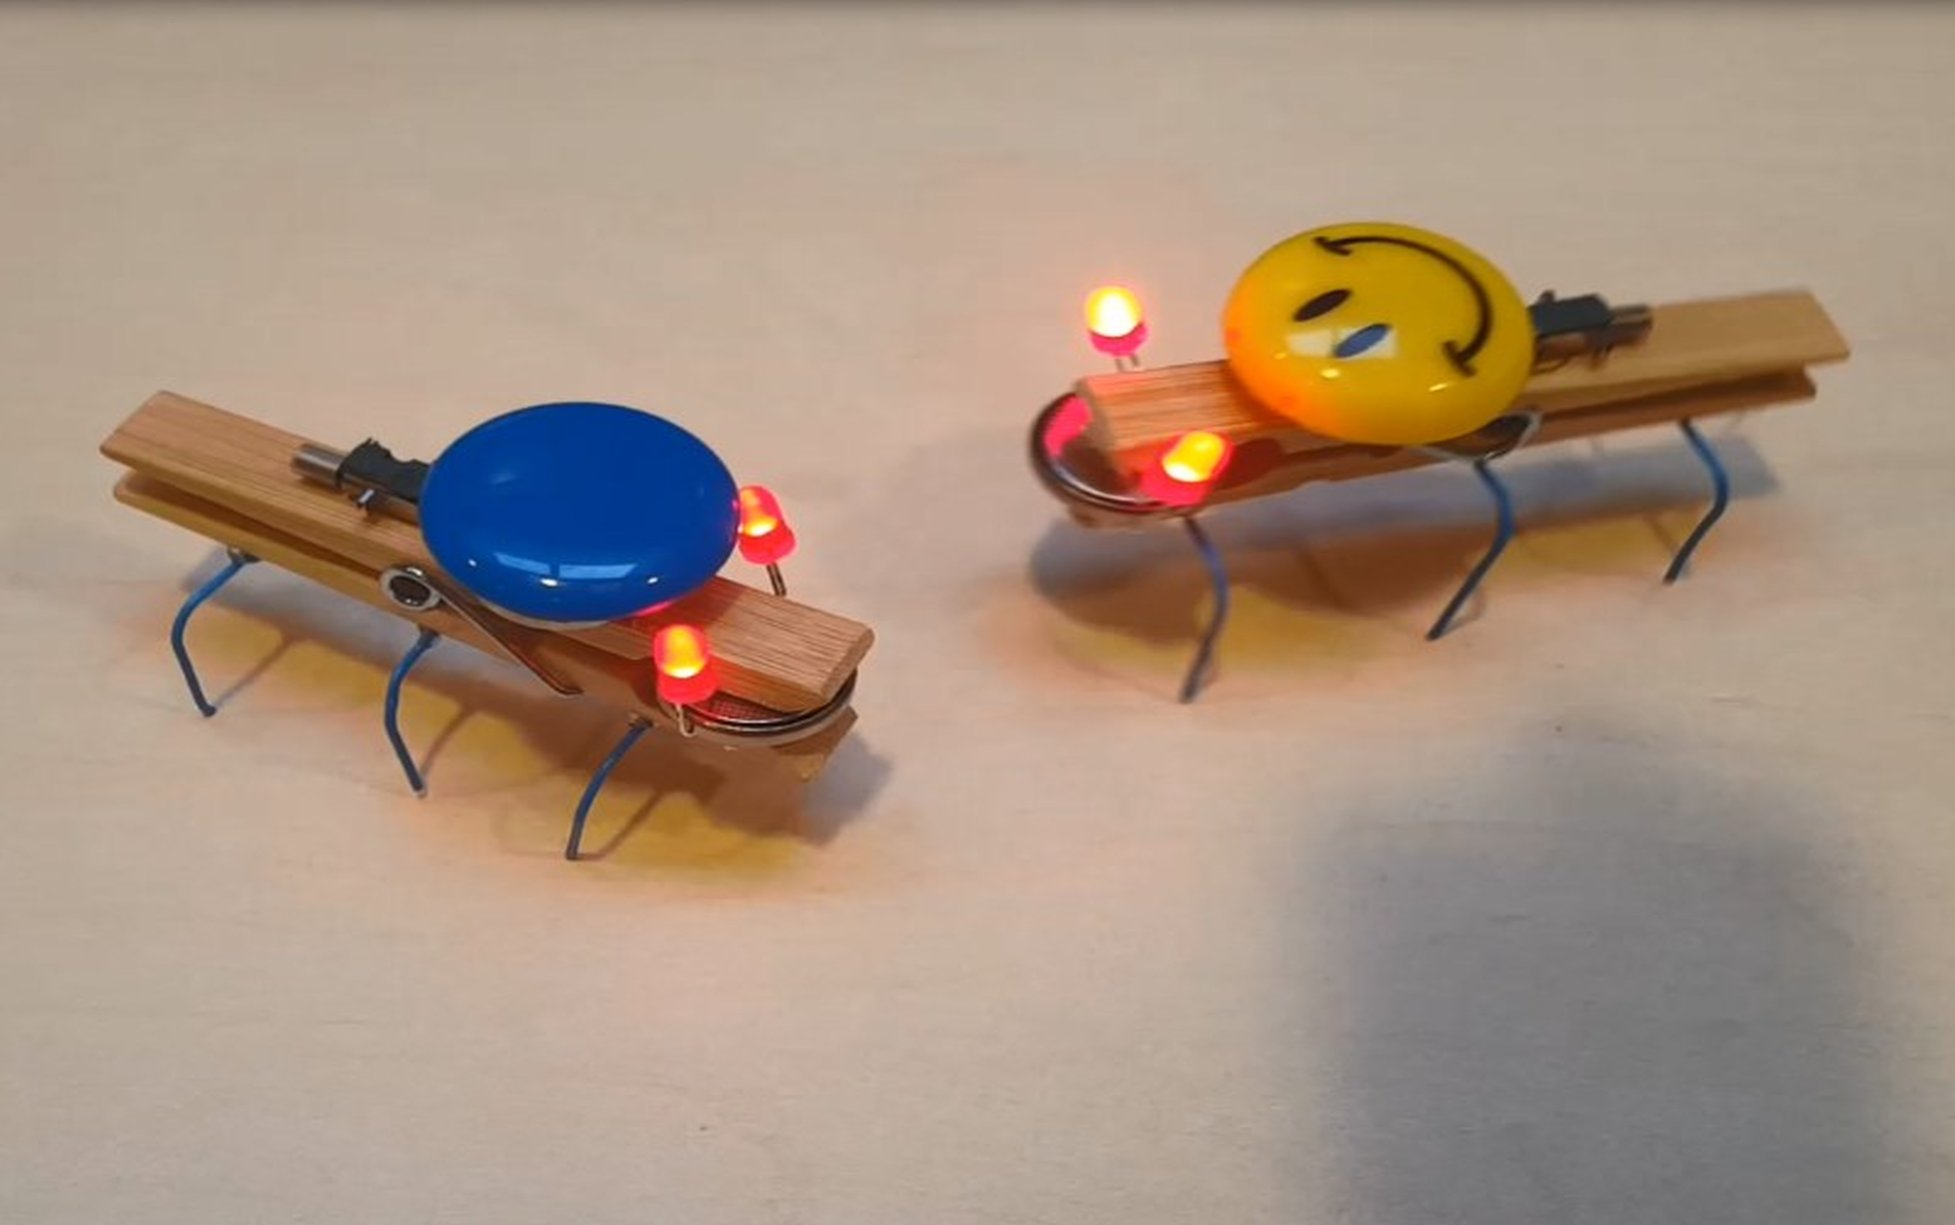 Na roboczo <br> robot klamerkowy